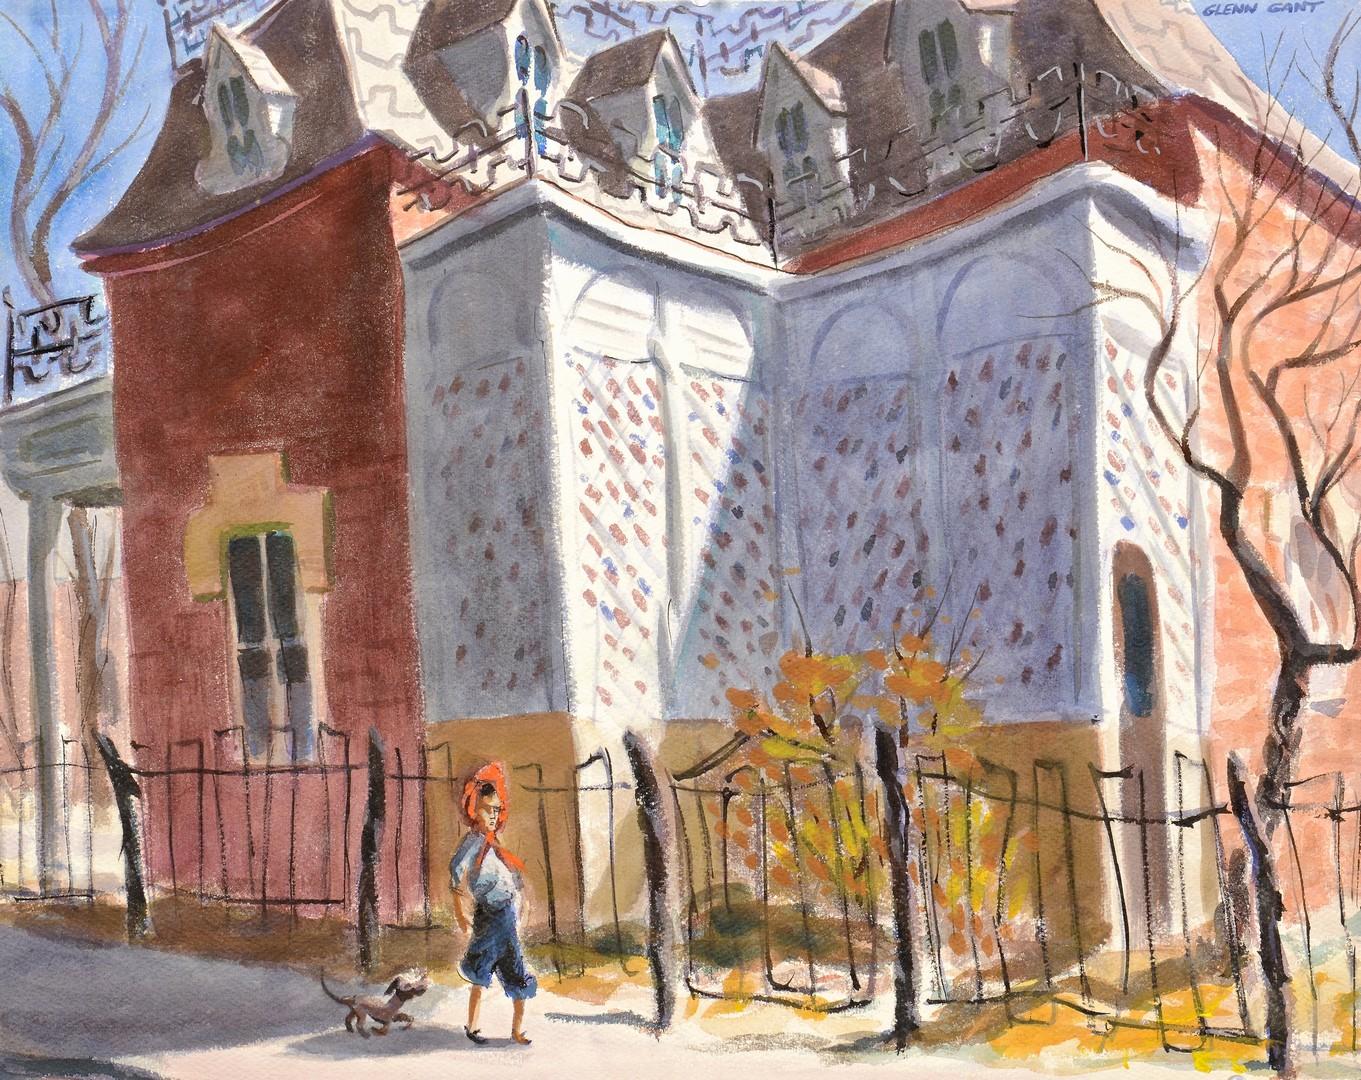 Lot 678: Glenn Gant Urban & Landscape Watercolor (2)